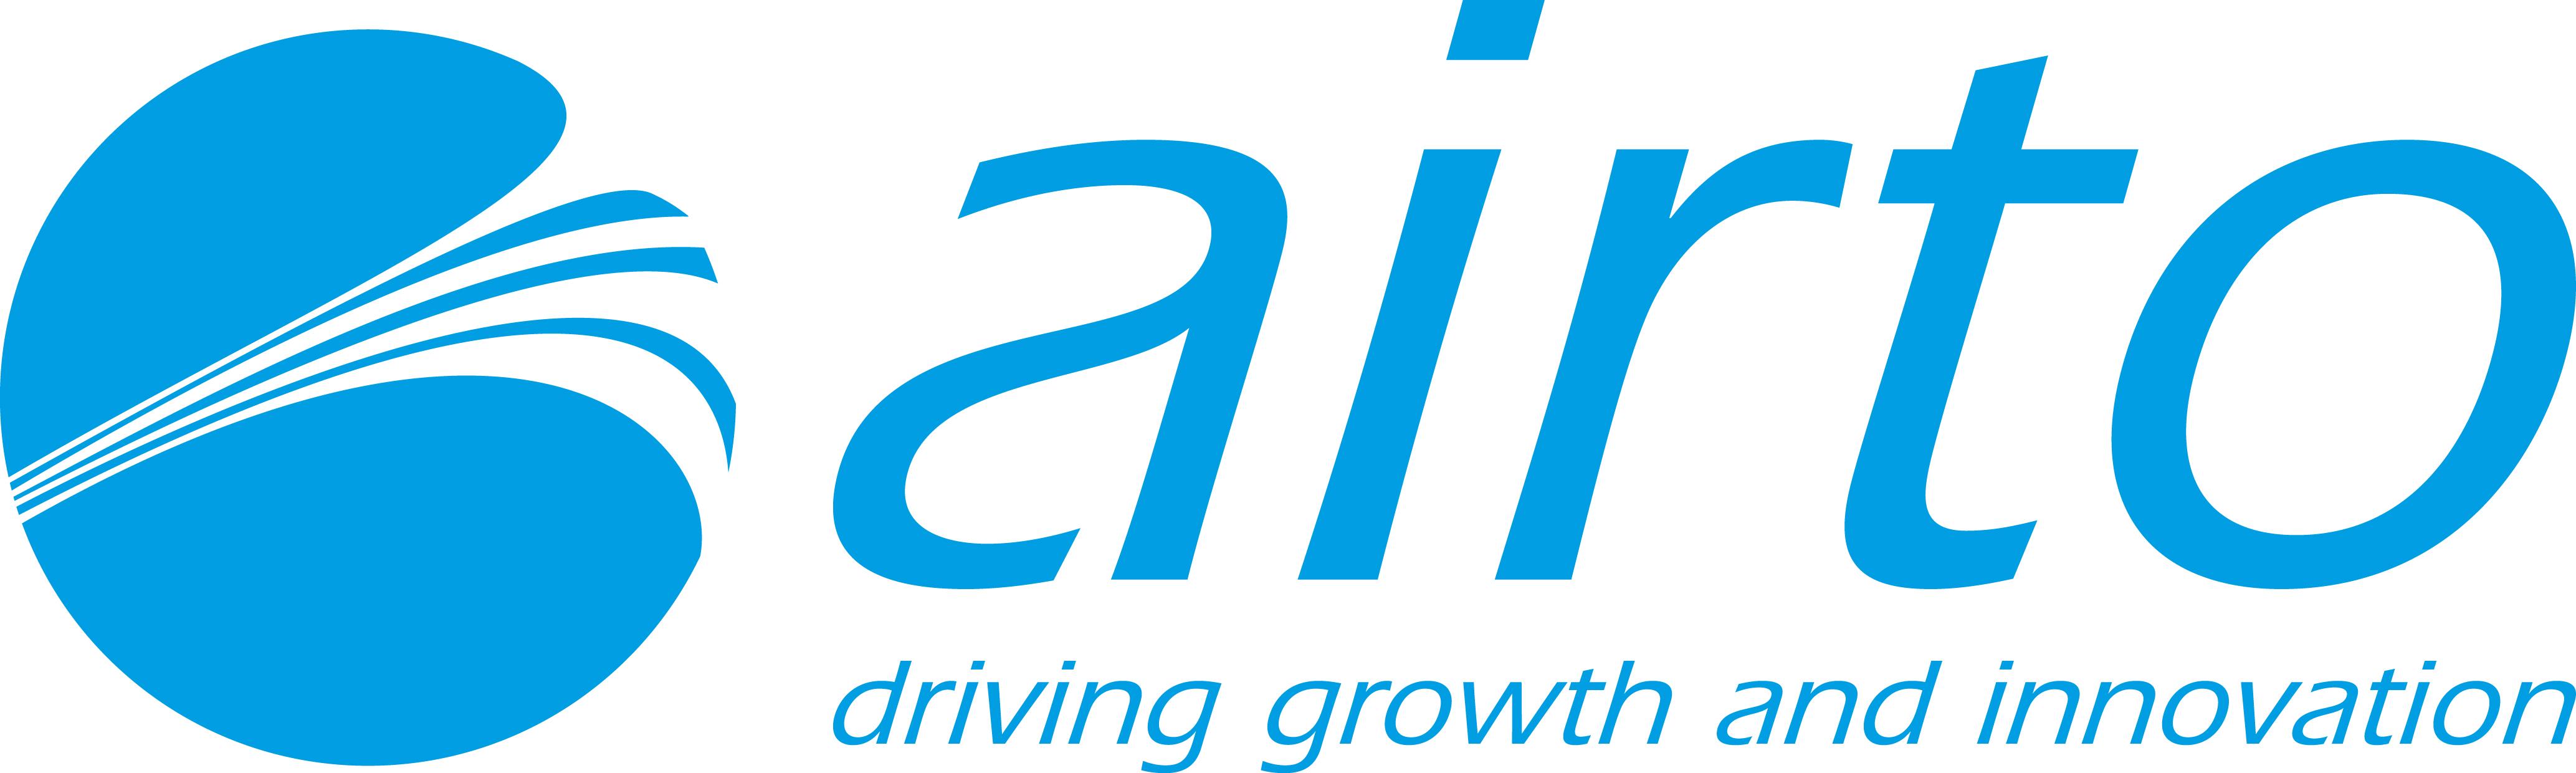 Airto logo new strapline